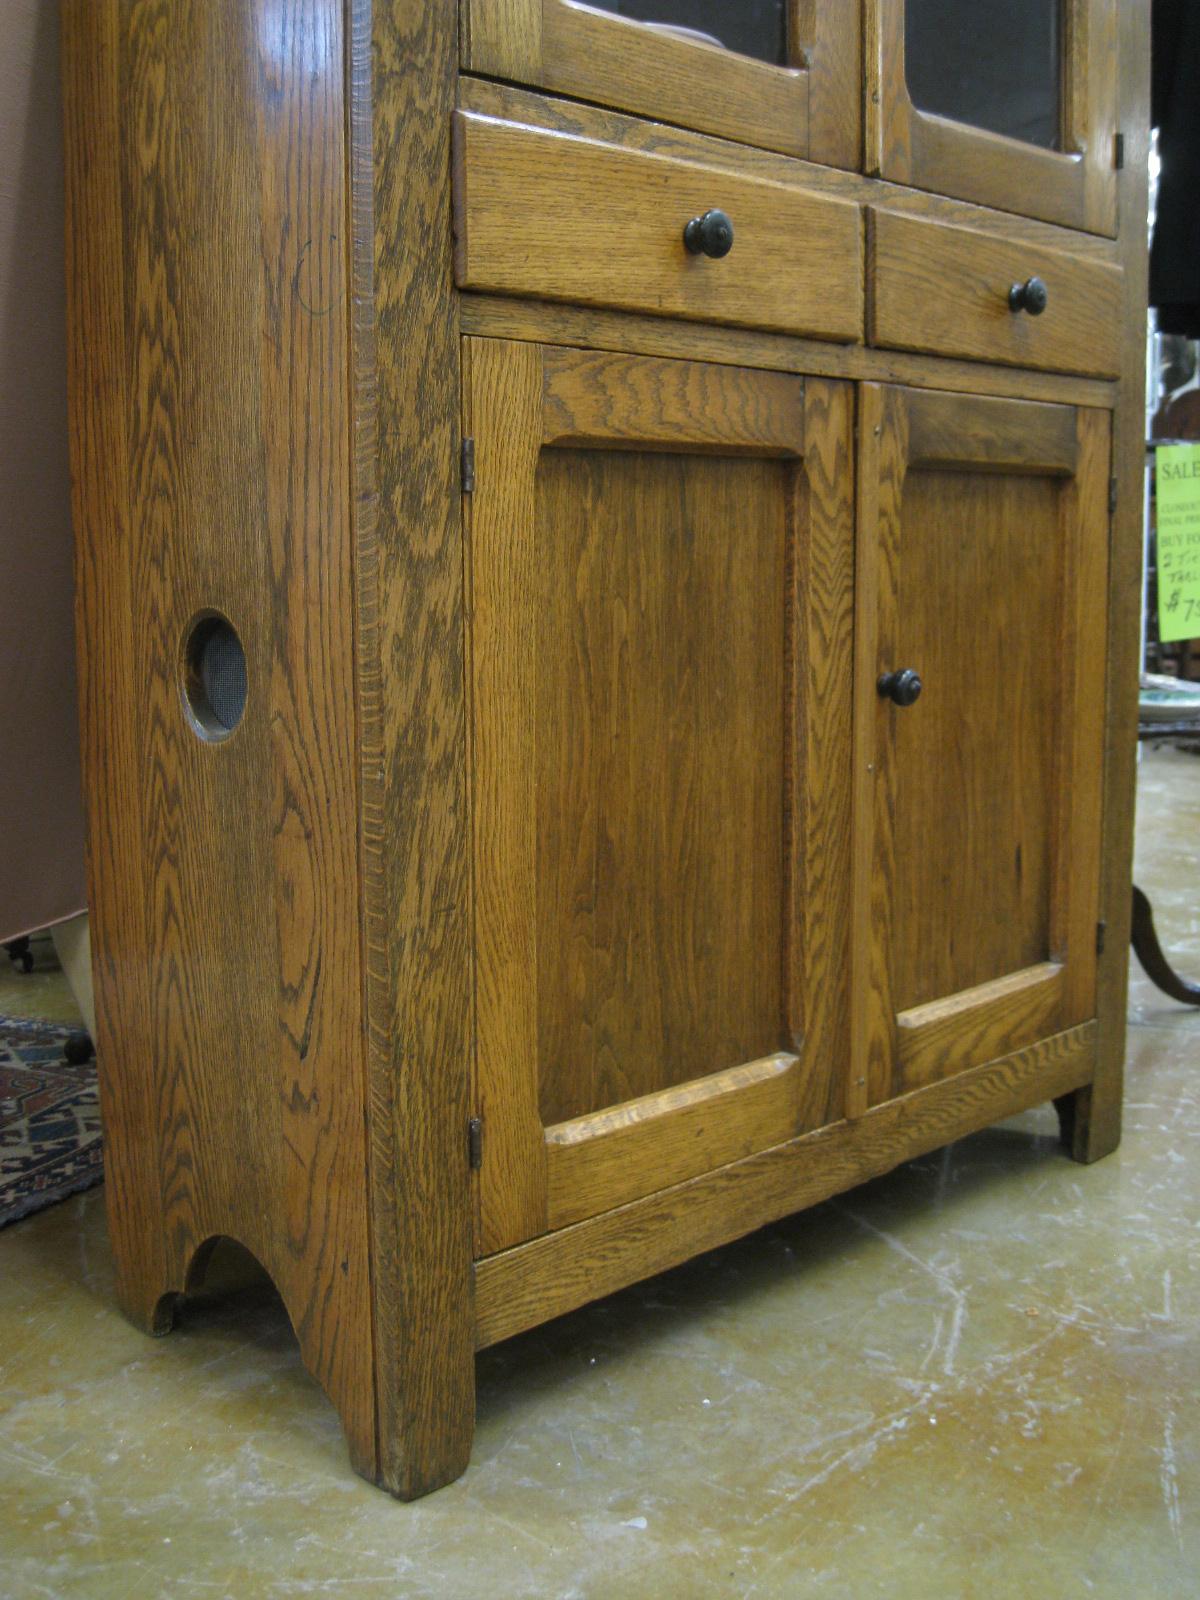 Antique furniture, China cabinet Pie Safe - Antiques, Art, And Collectibles: Antique Furniture, China Cabinet